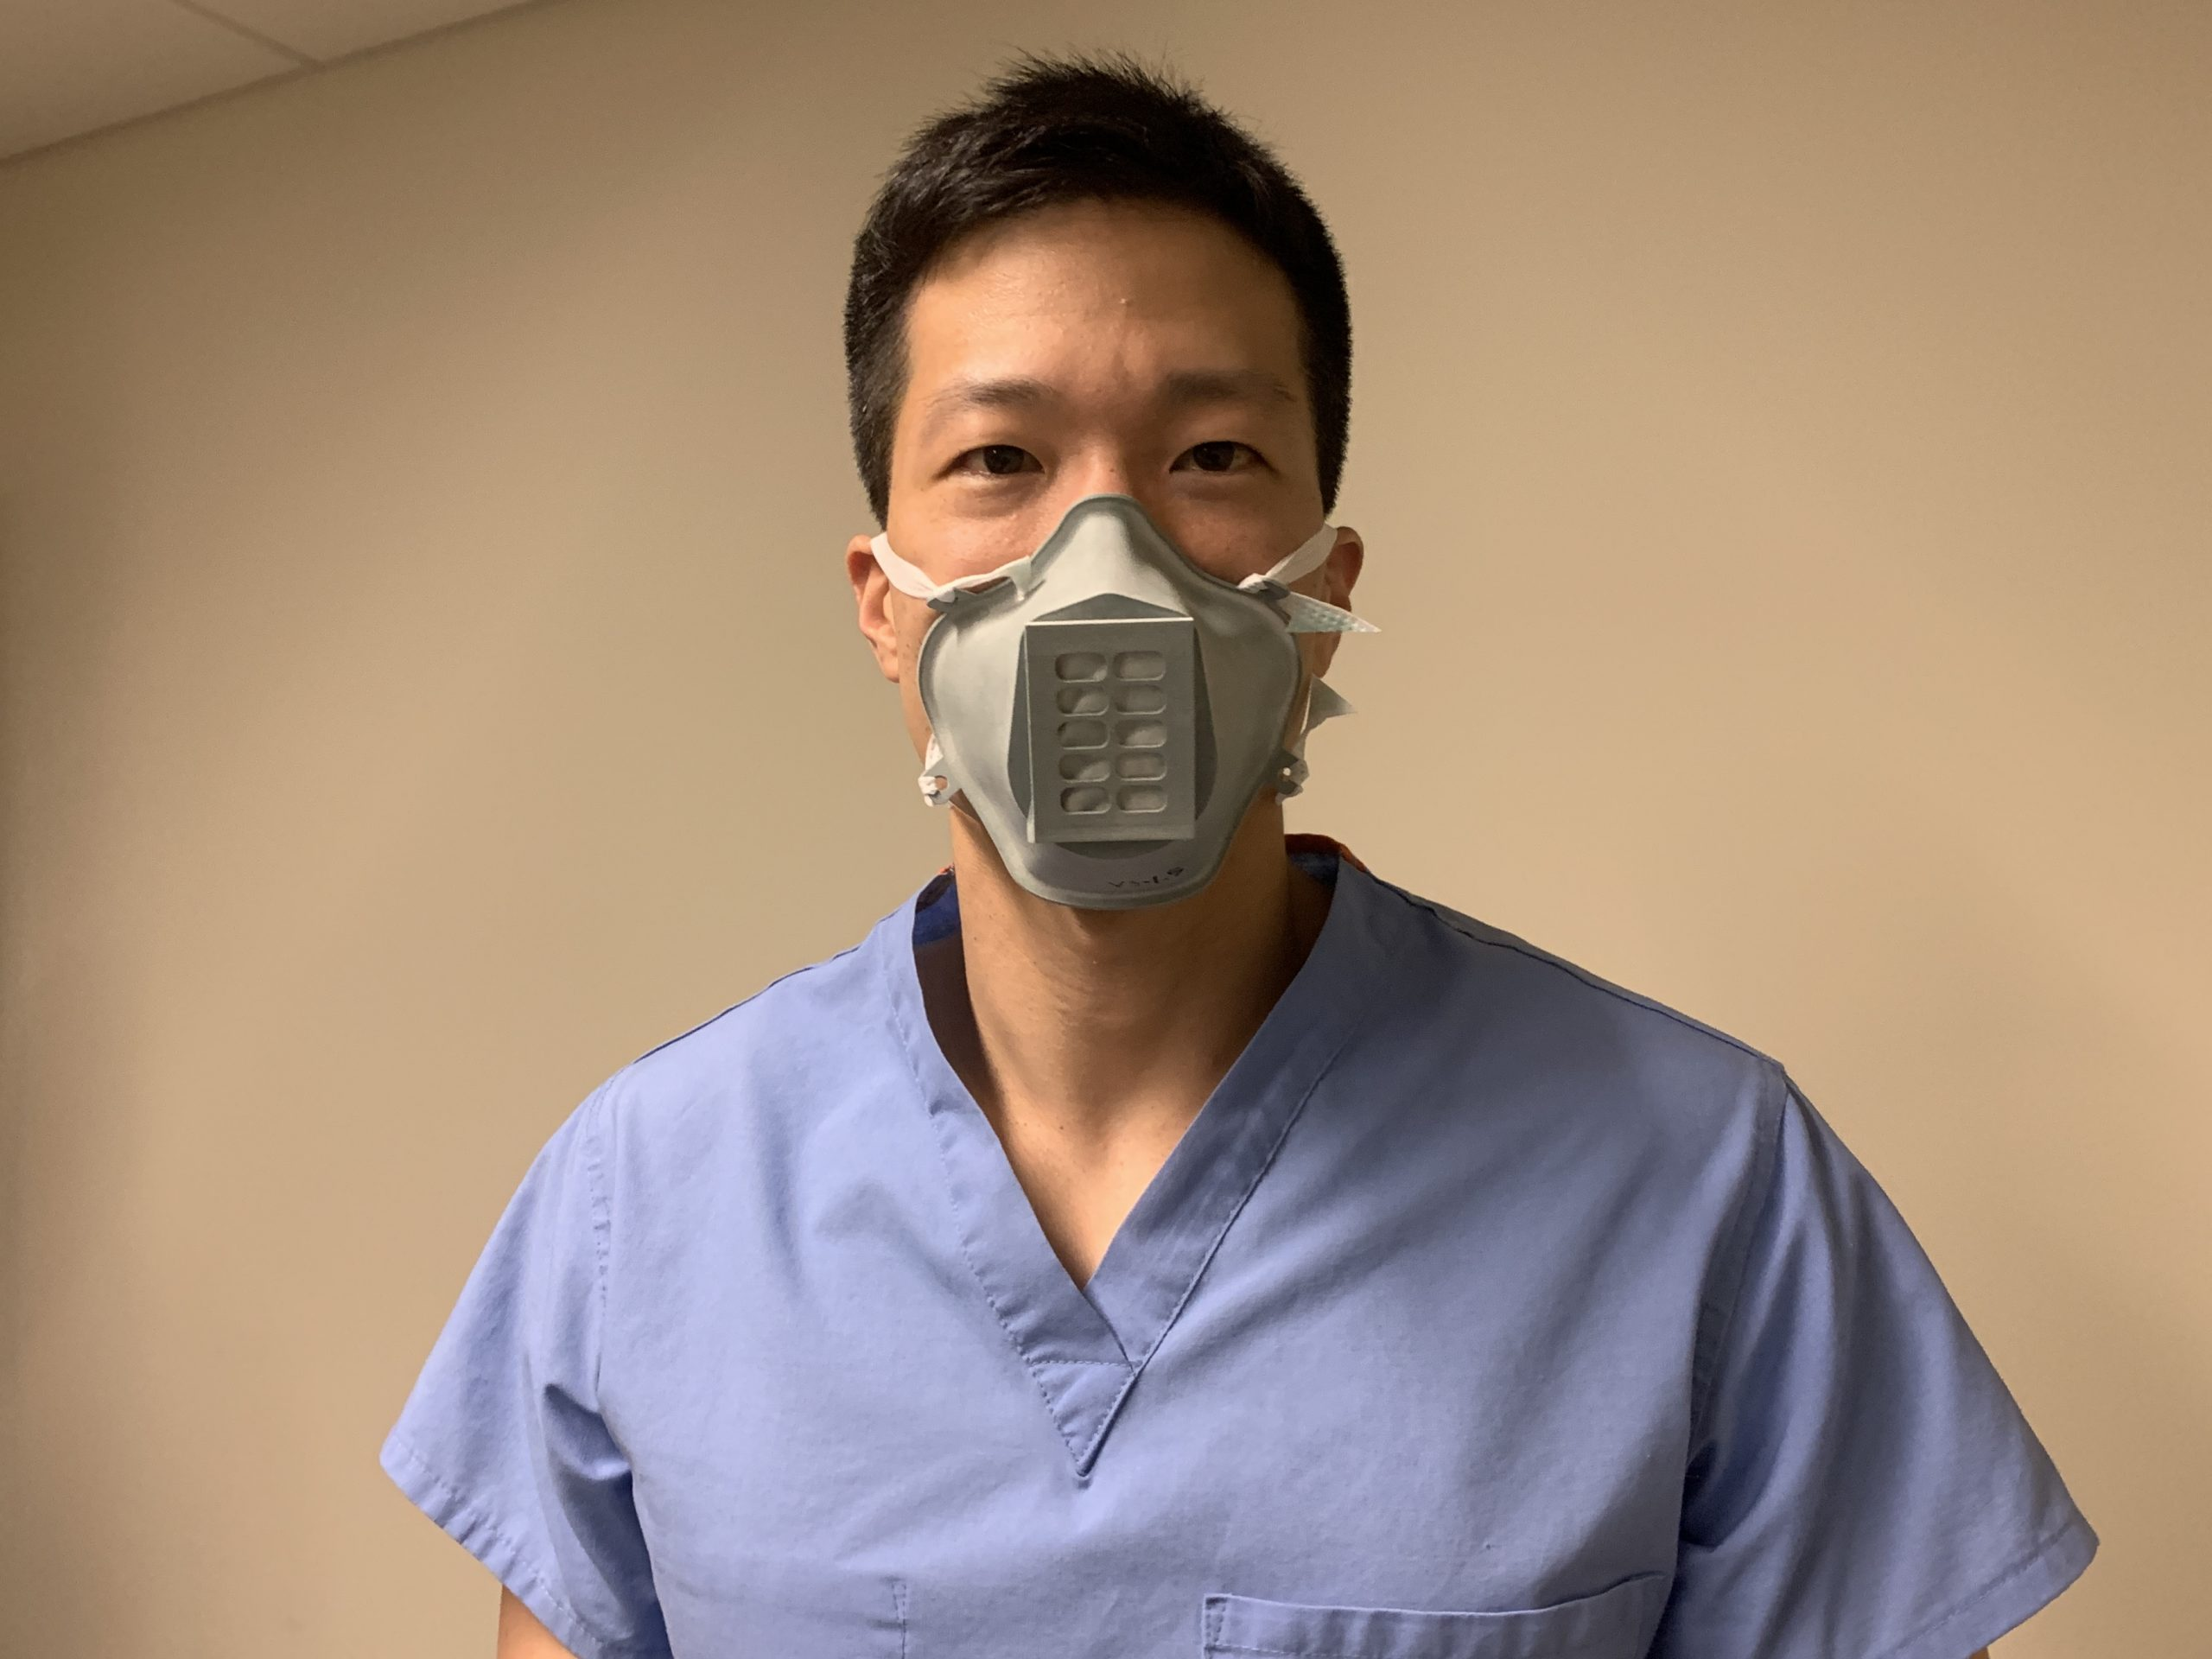 Stopgap Surgical Face Mask design